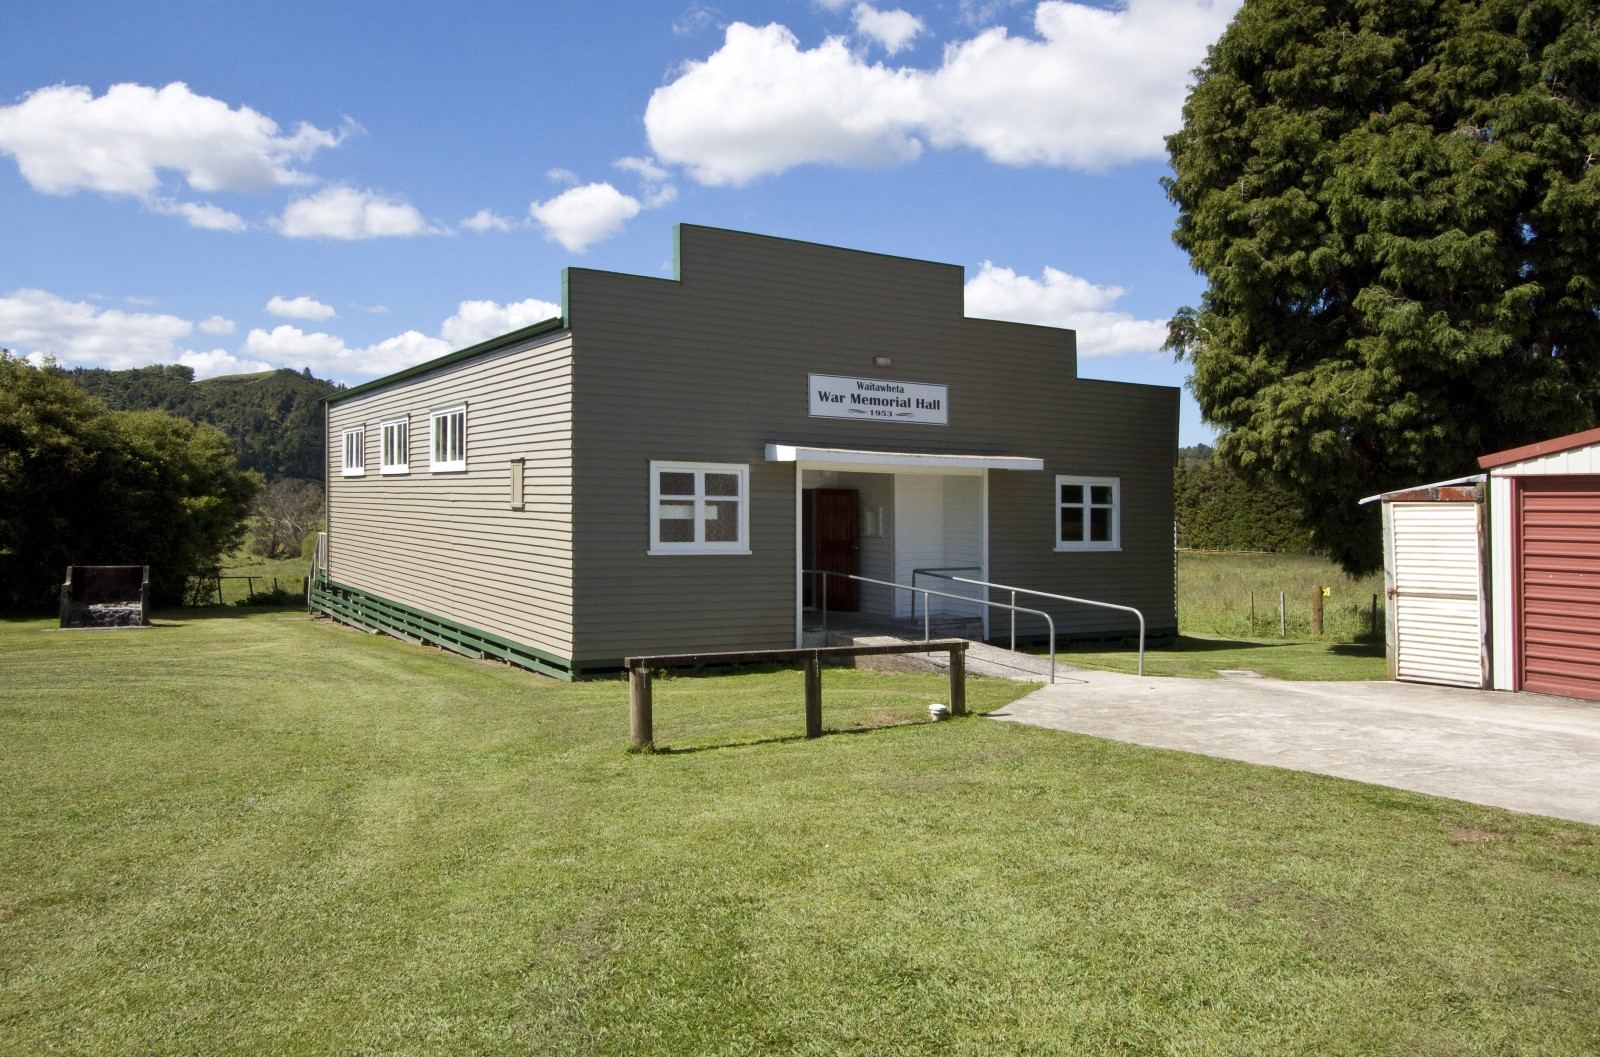 Waitawheta War Memorial Hall